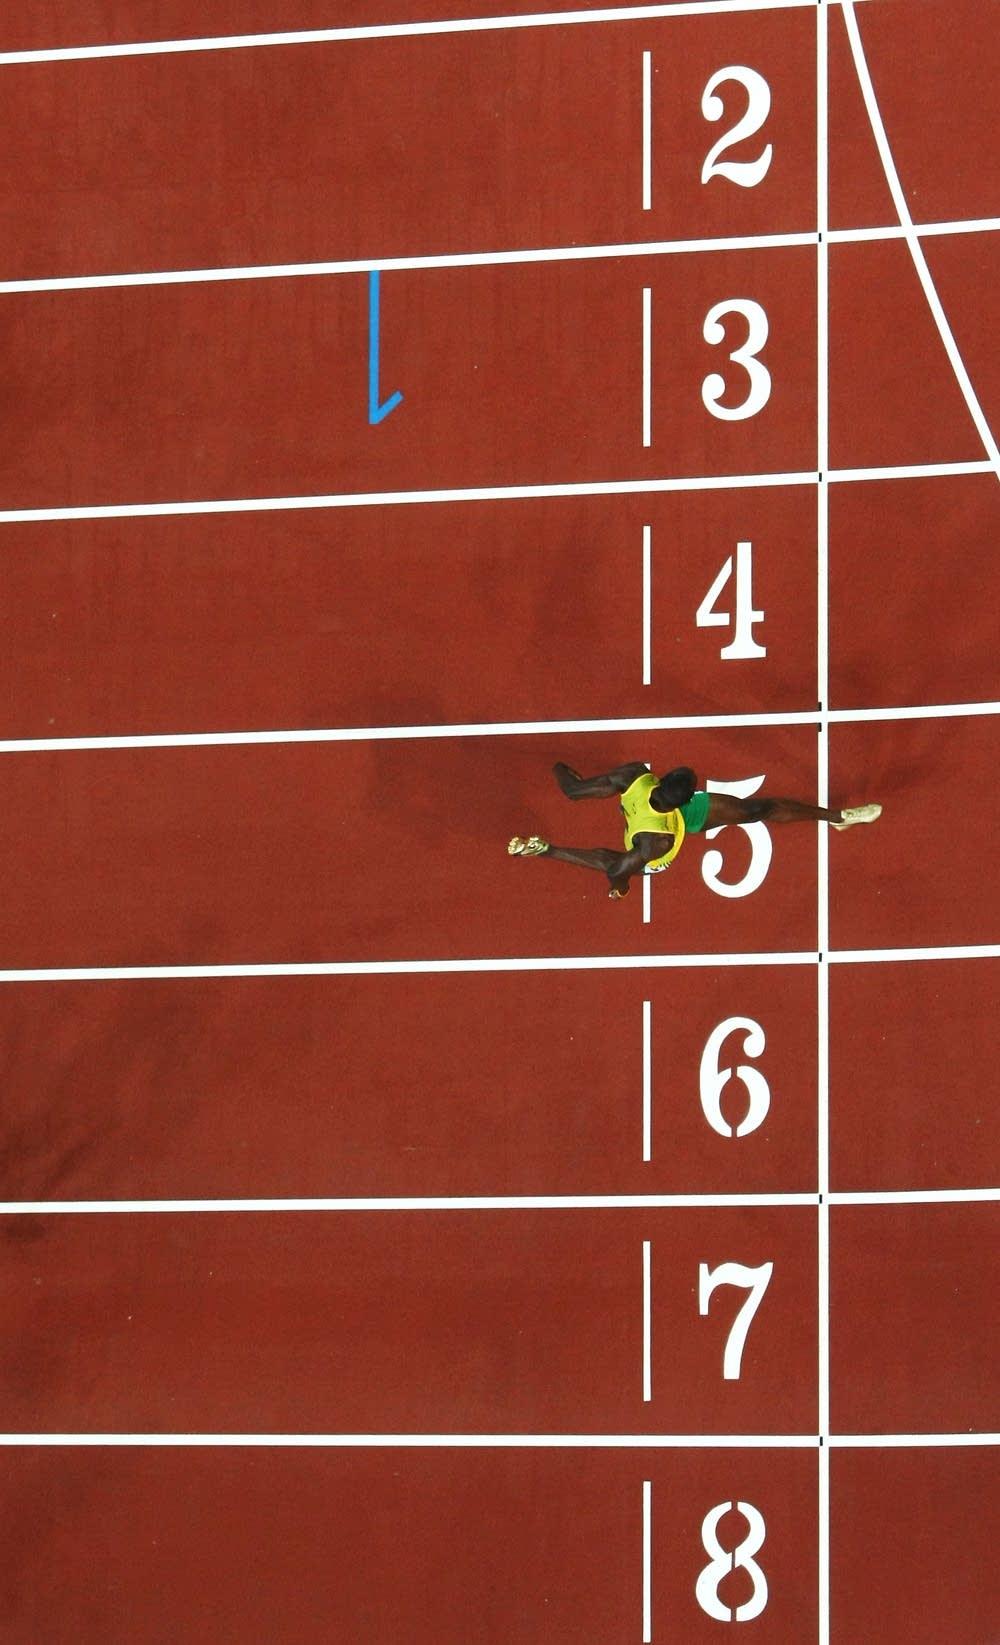 Bolt sets a new world record